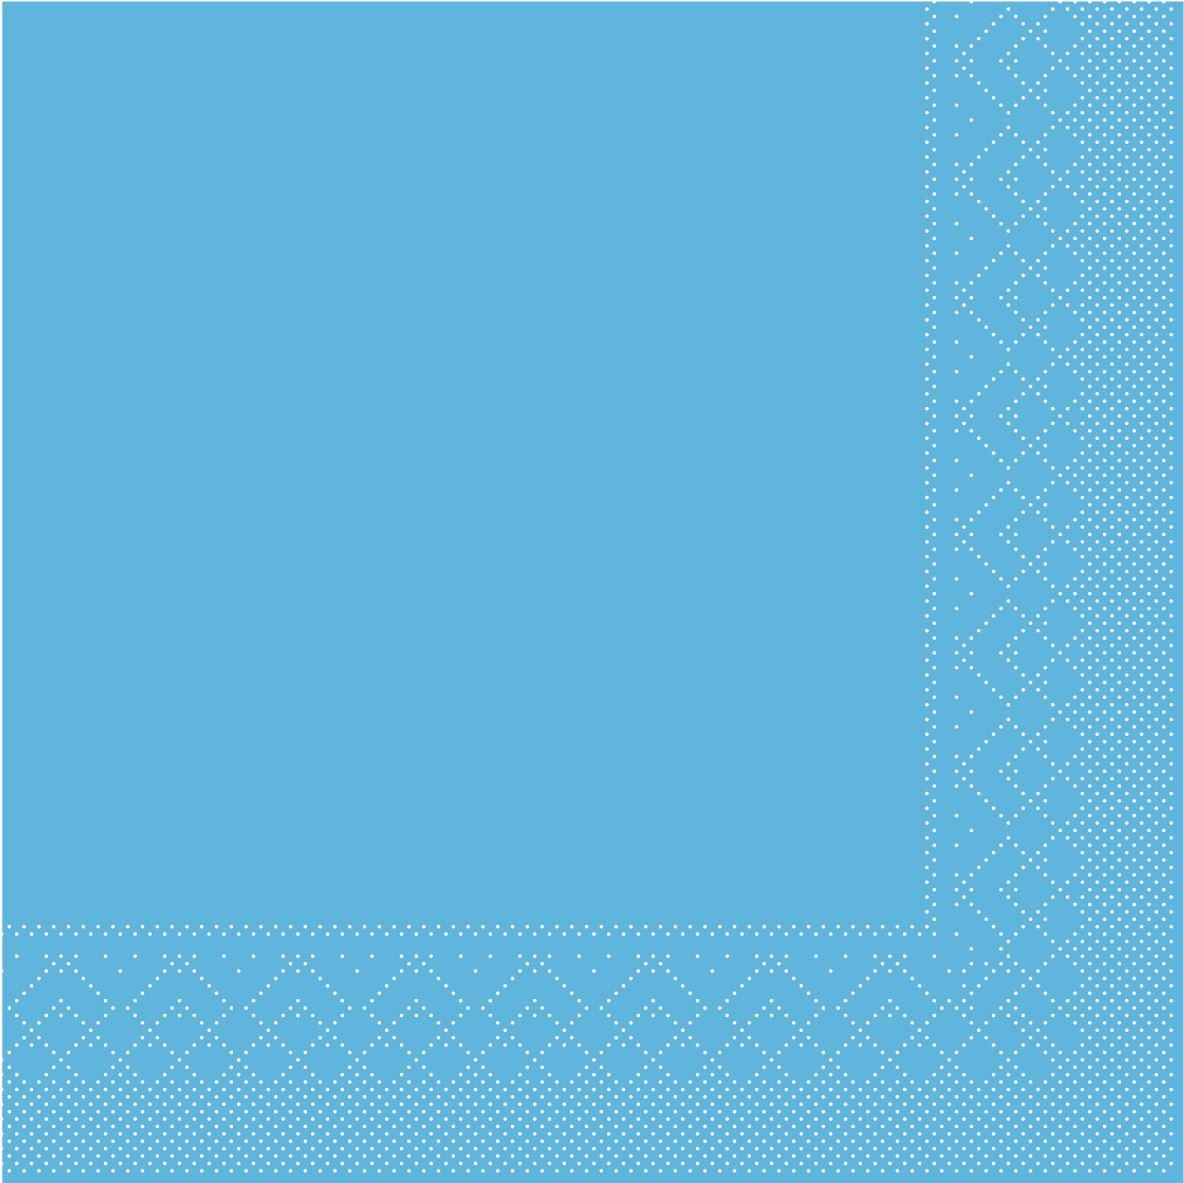 Servilletas de pañuelos 33x33 cm - BASIC  AQUA-BLAU  33x33 cm 1/4-Falz